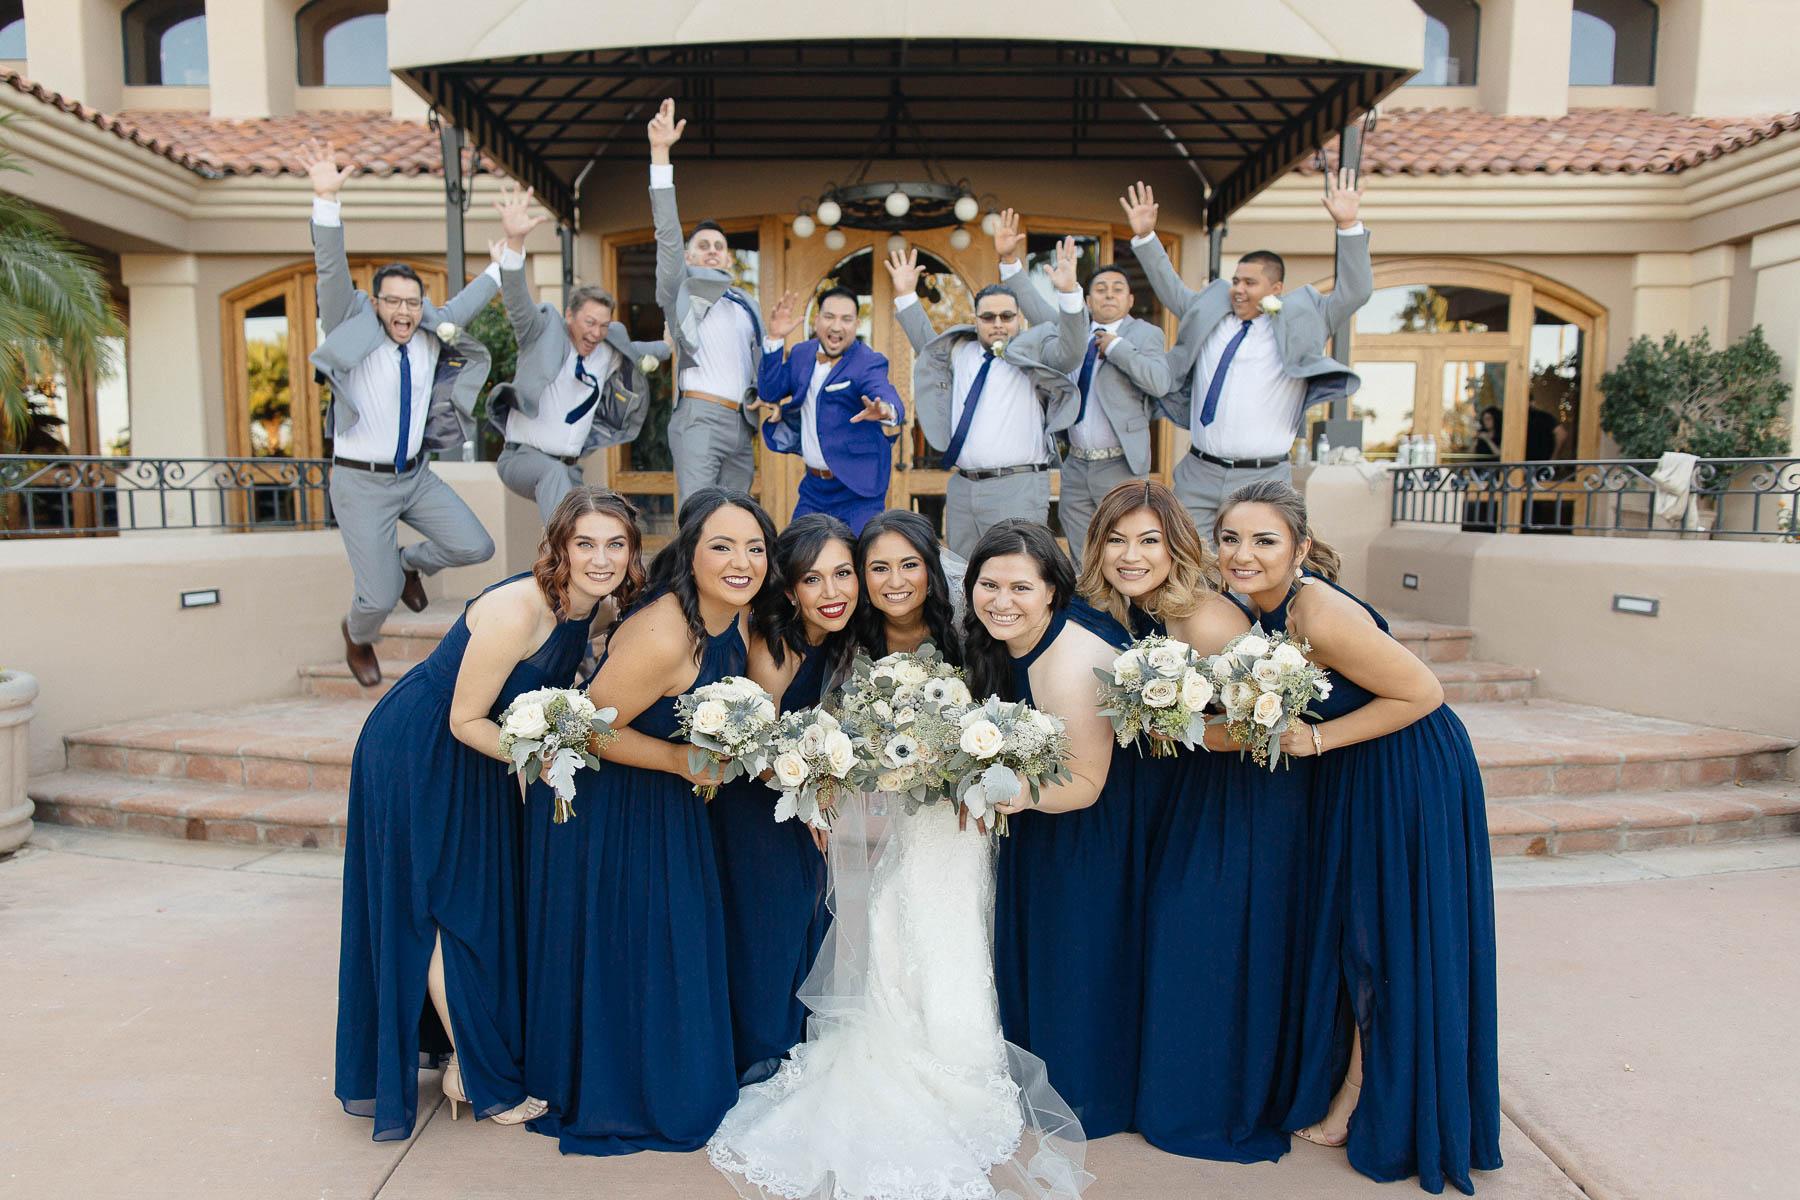 161029-Luxium-Weddings-Arizona-Jeff-Griselda-First-Look-Val-Vista-Lakes-Gilber-050.jpg